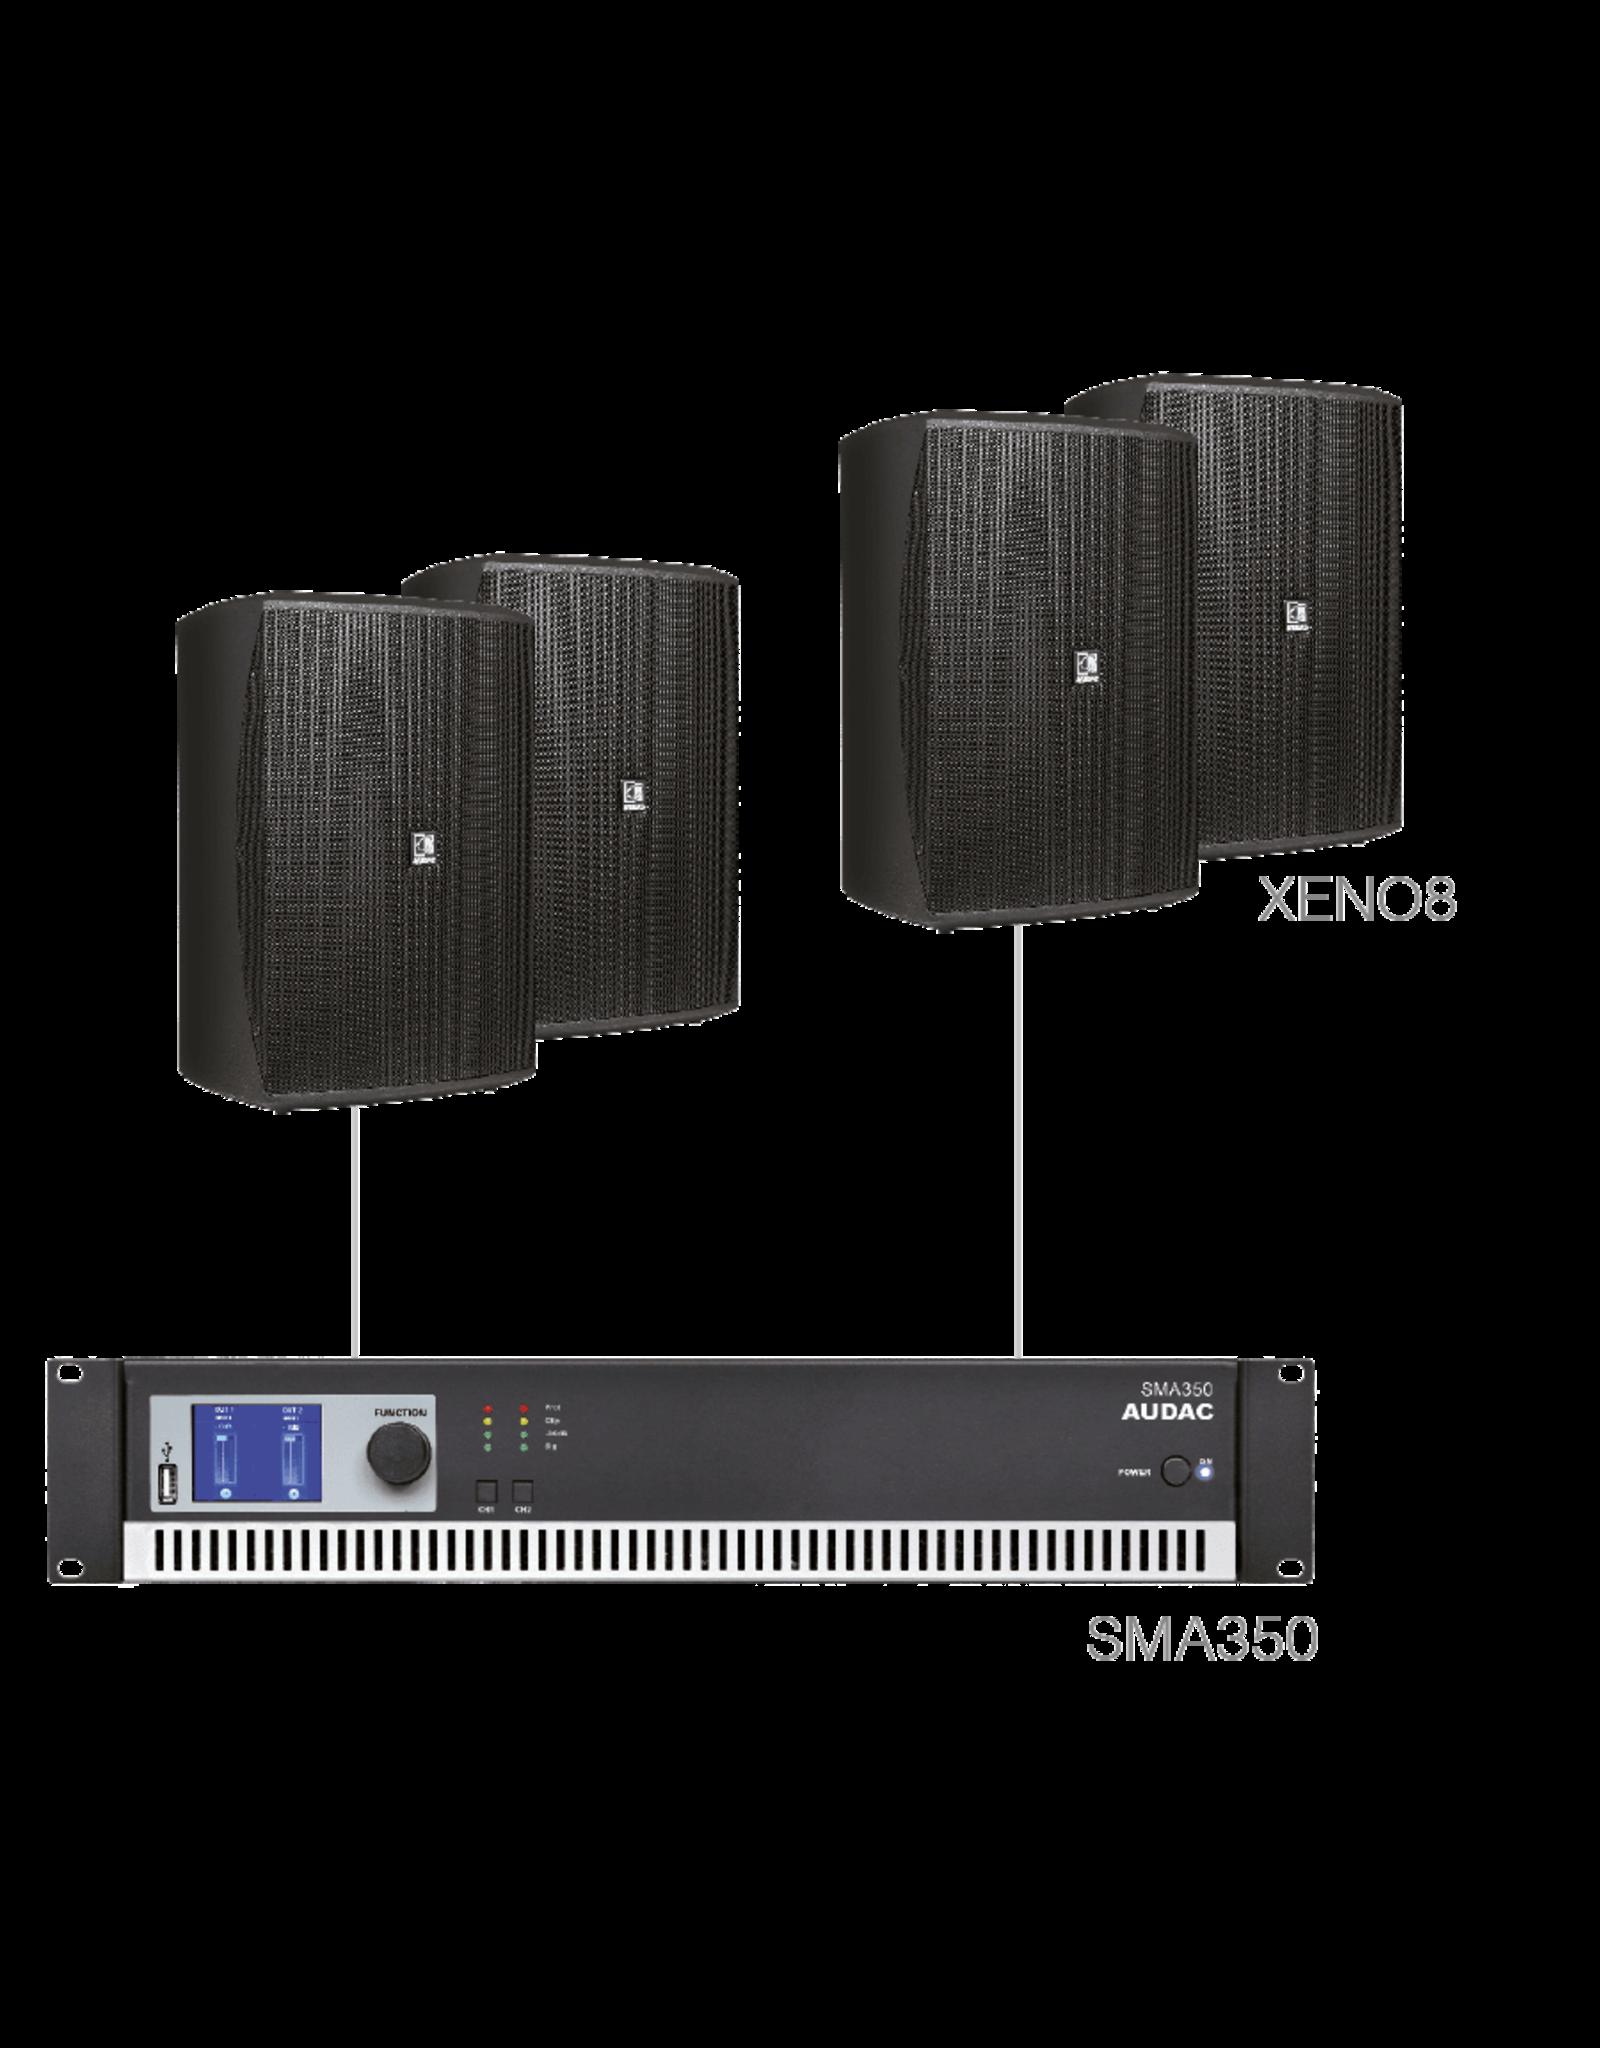 Audac 4 x XENO8 + SMA350 Black version